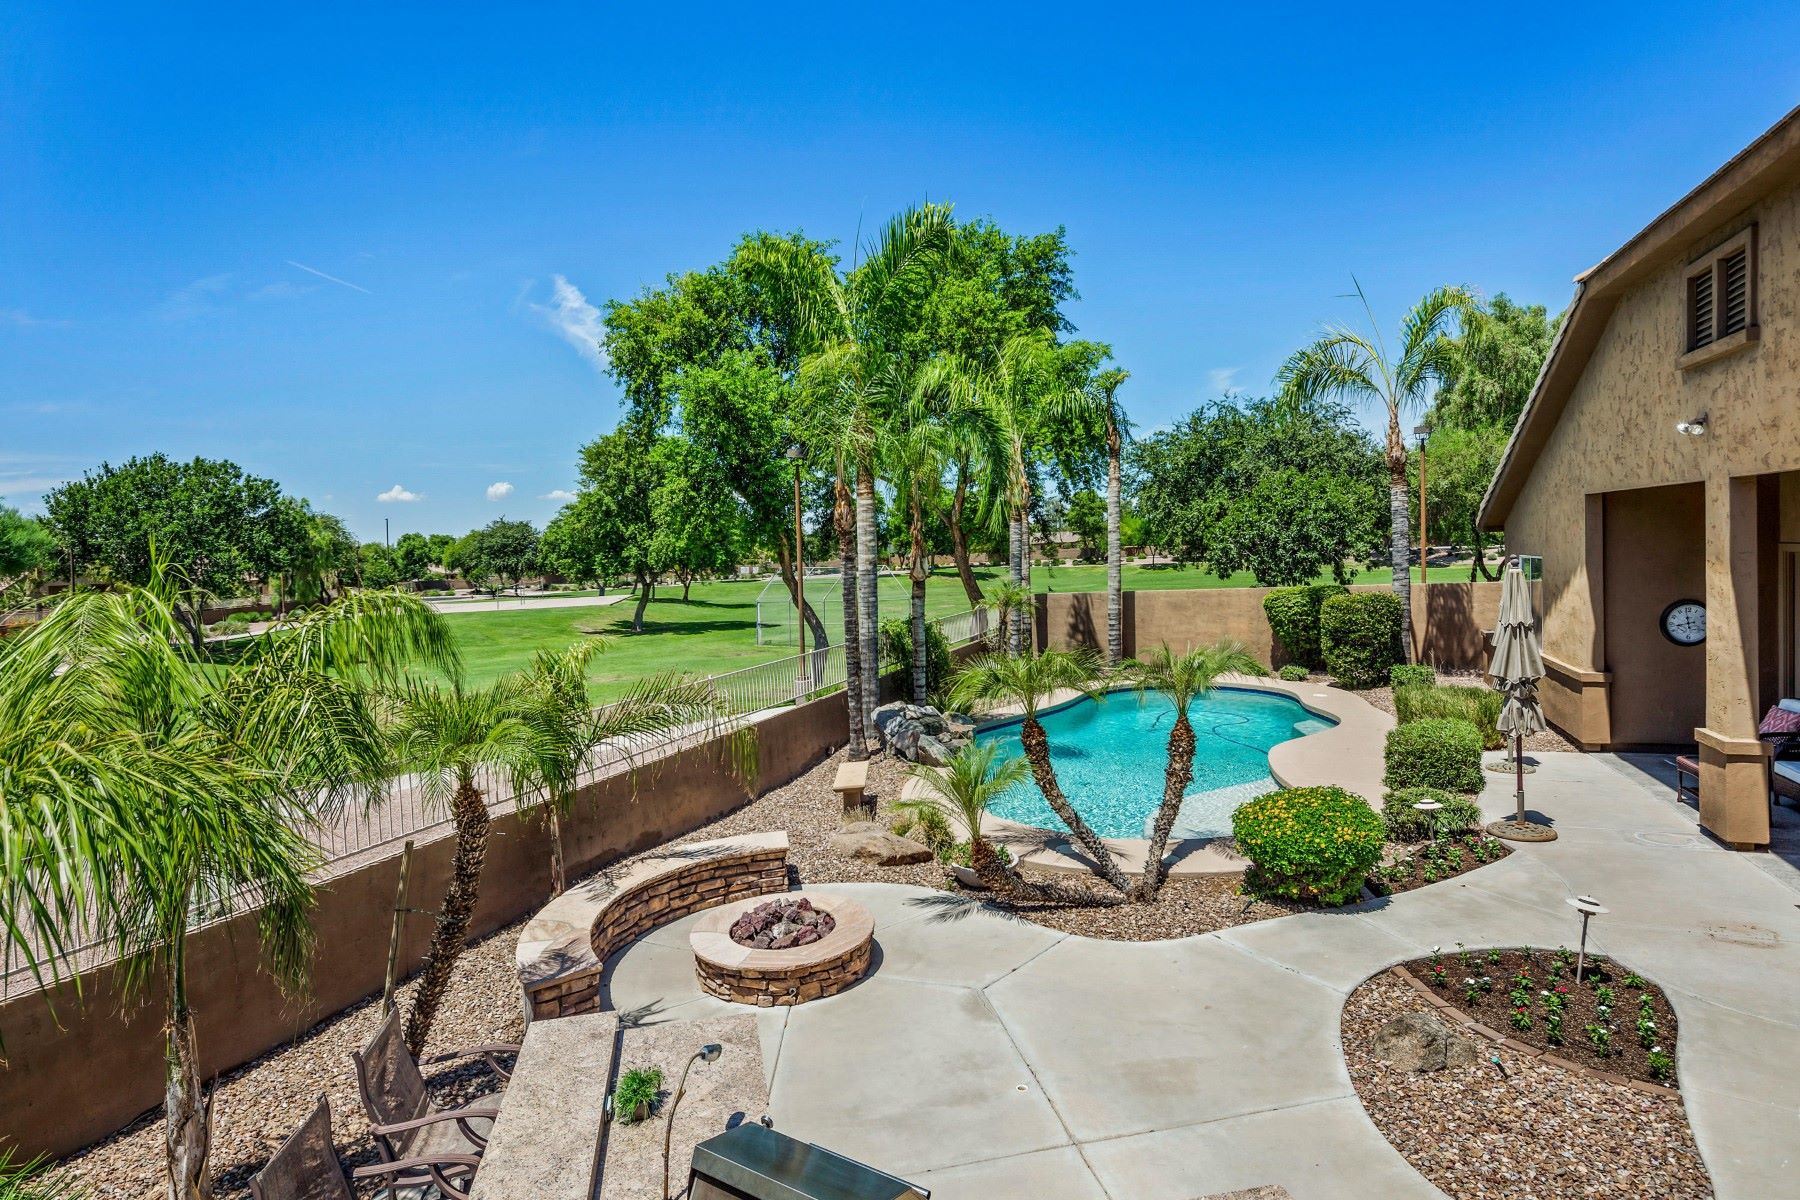 Single Family Homes for Sale at Jake's Ranch 615 E HAMPTON CT Gilbert, Arizona 85295 United States